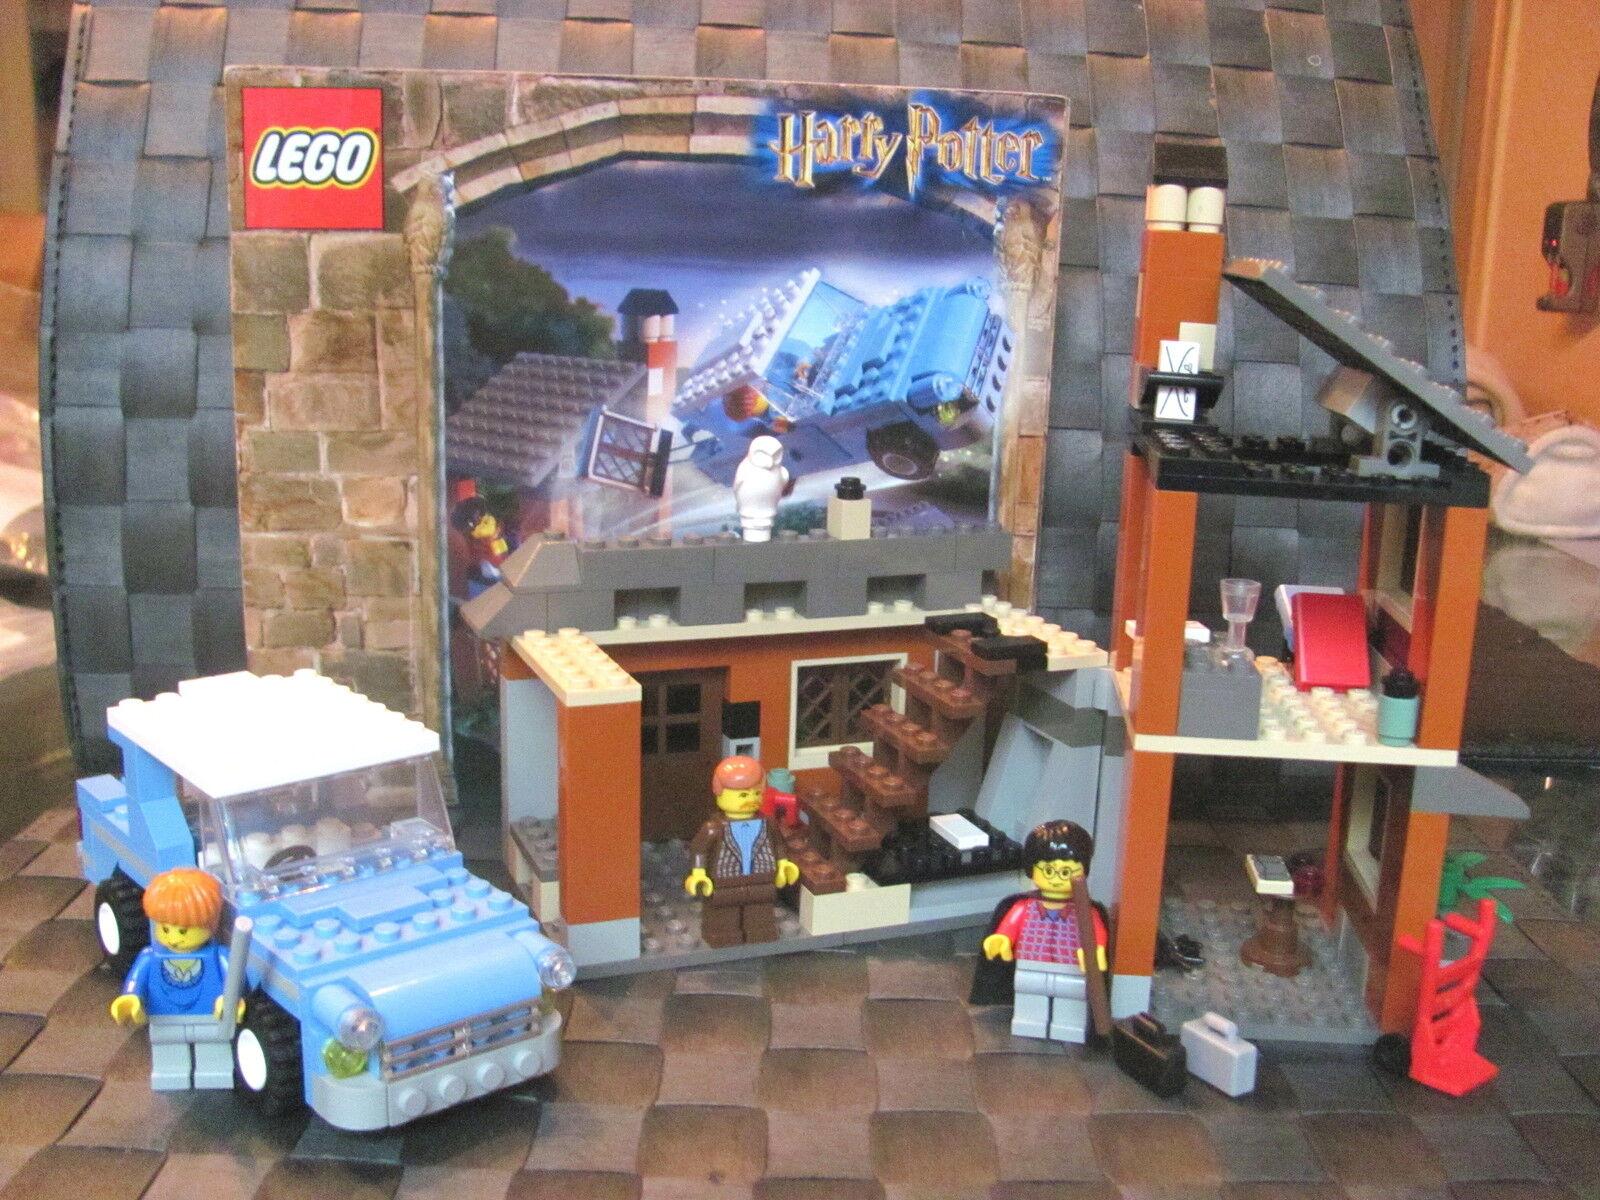 LEGO Harry Potter 4728 Flucht Ligusterweg u u u BA inkl 3 Fig. u. Zugabe Zimmer 0d81c4